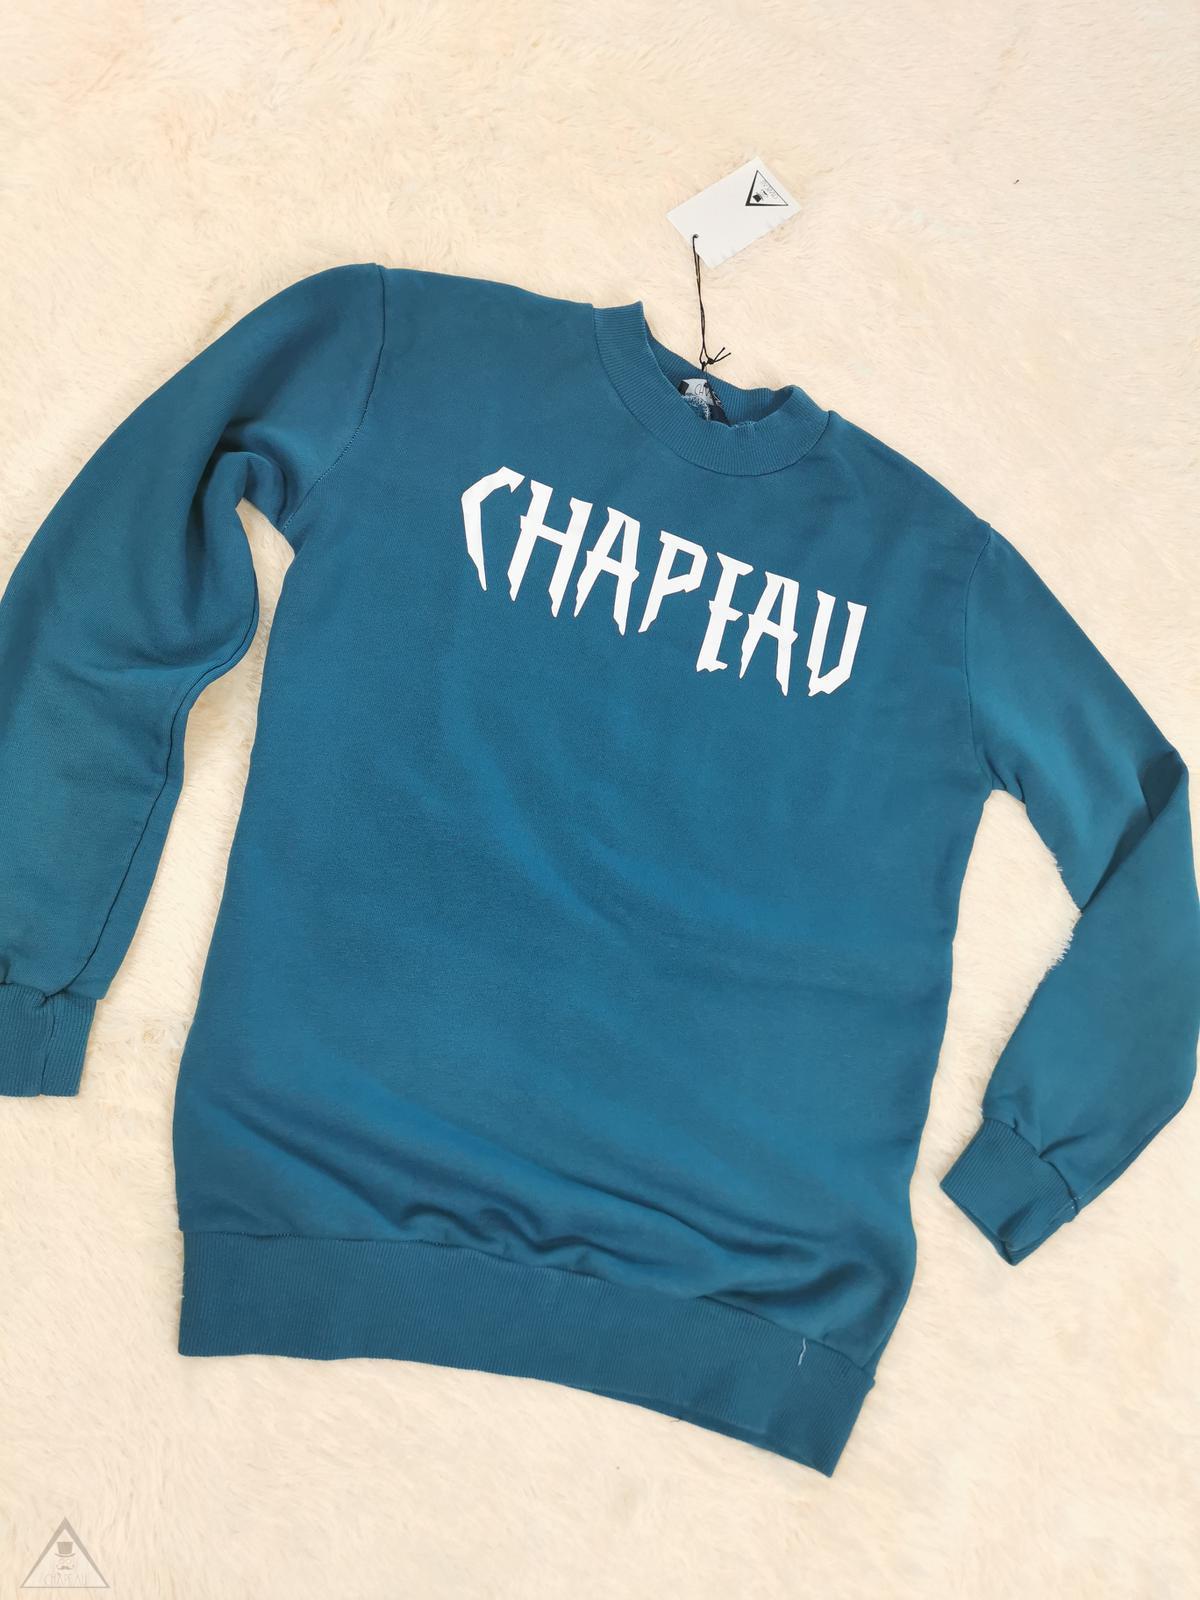 Felpa ottanio Chapeau